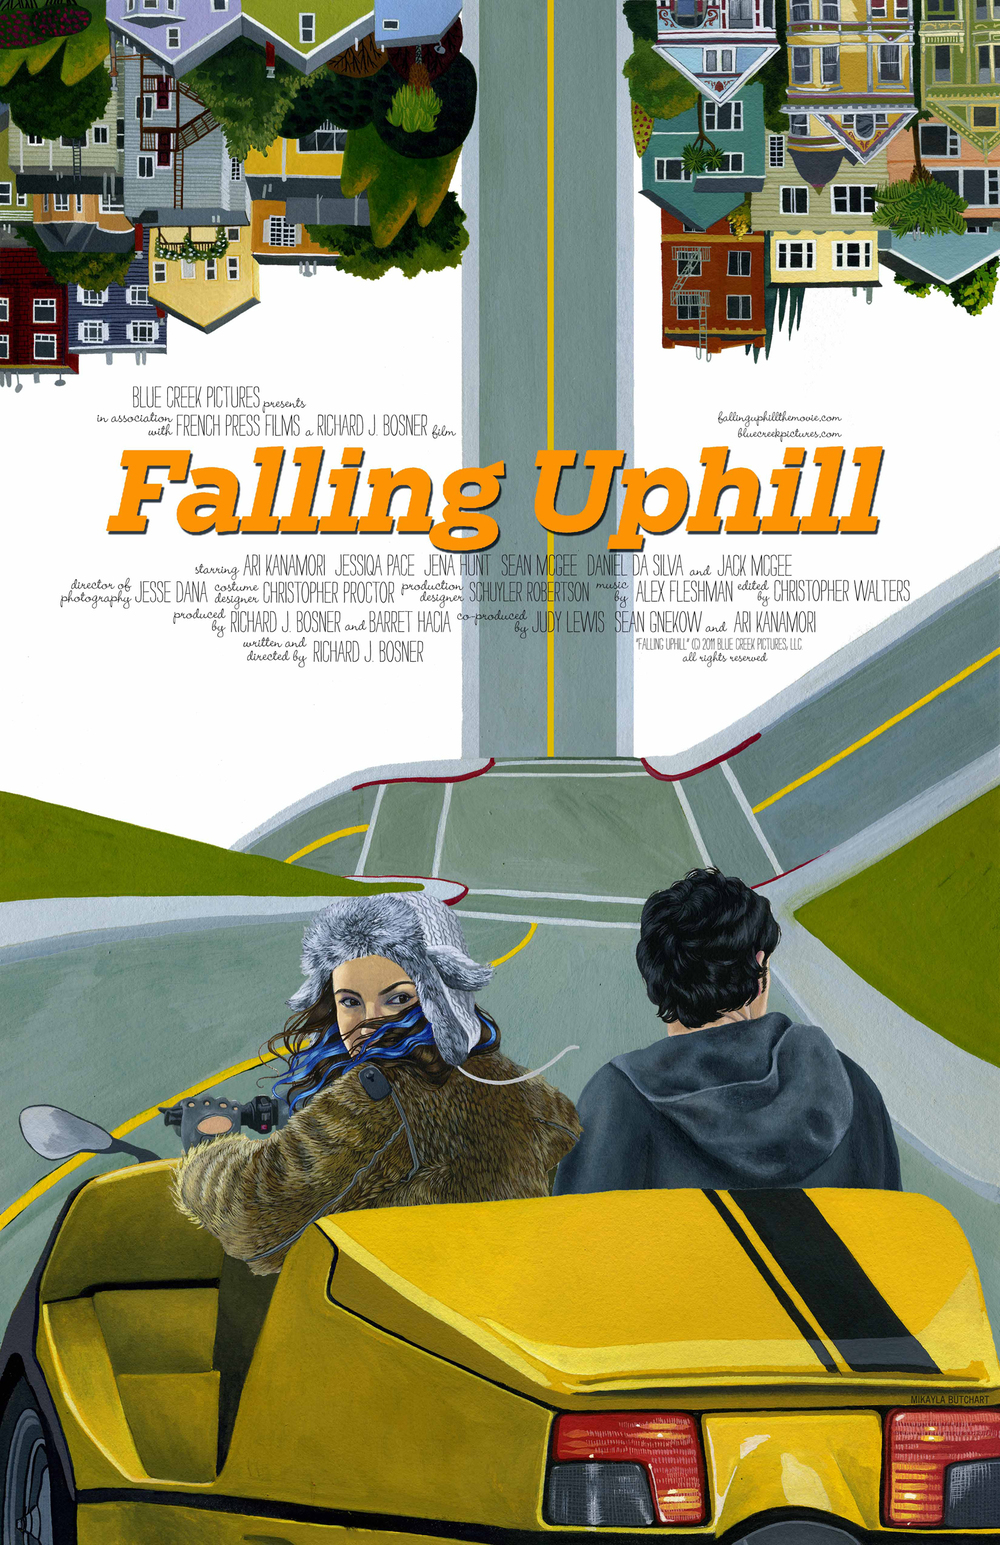 mikaylabutchart_fallinguphill.jpg